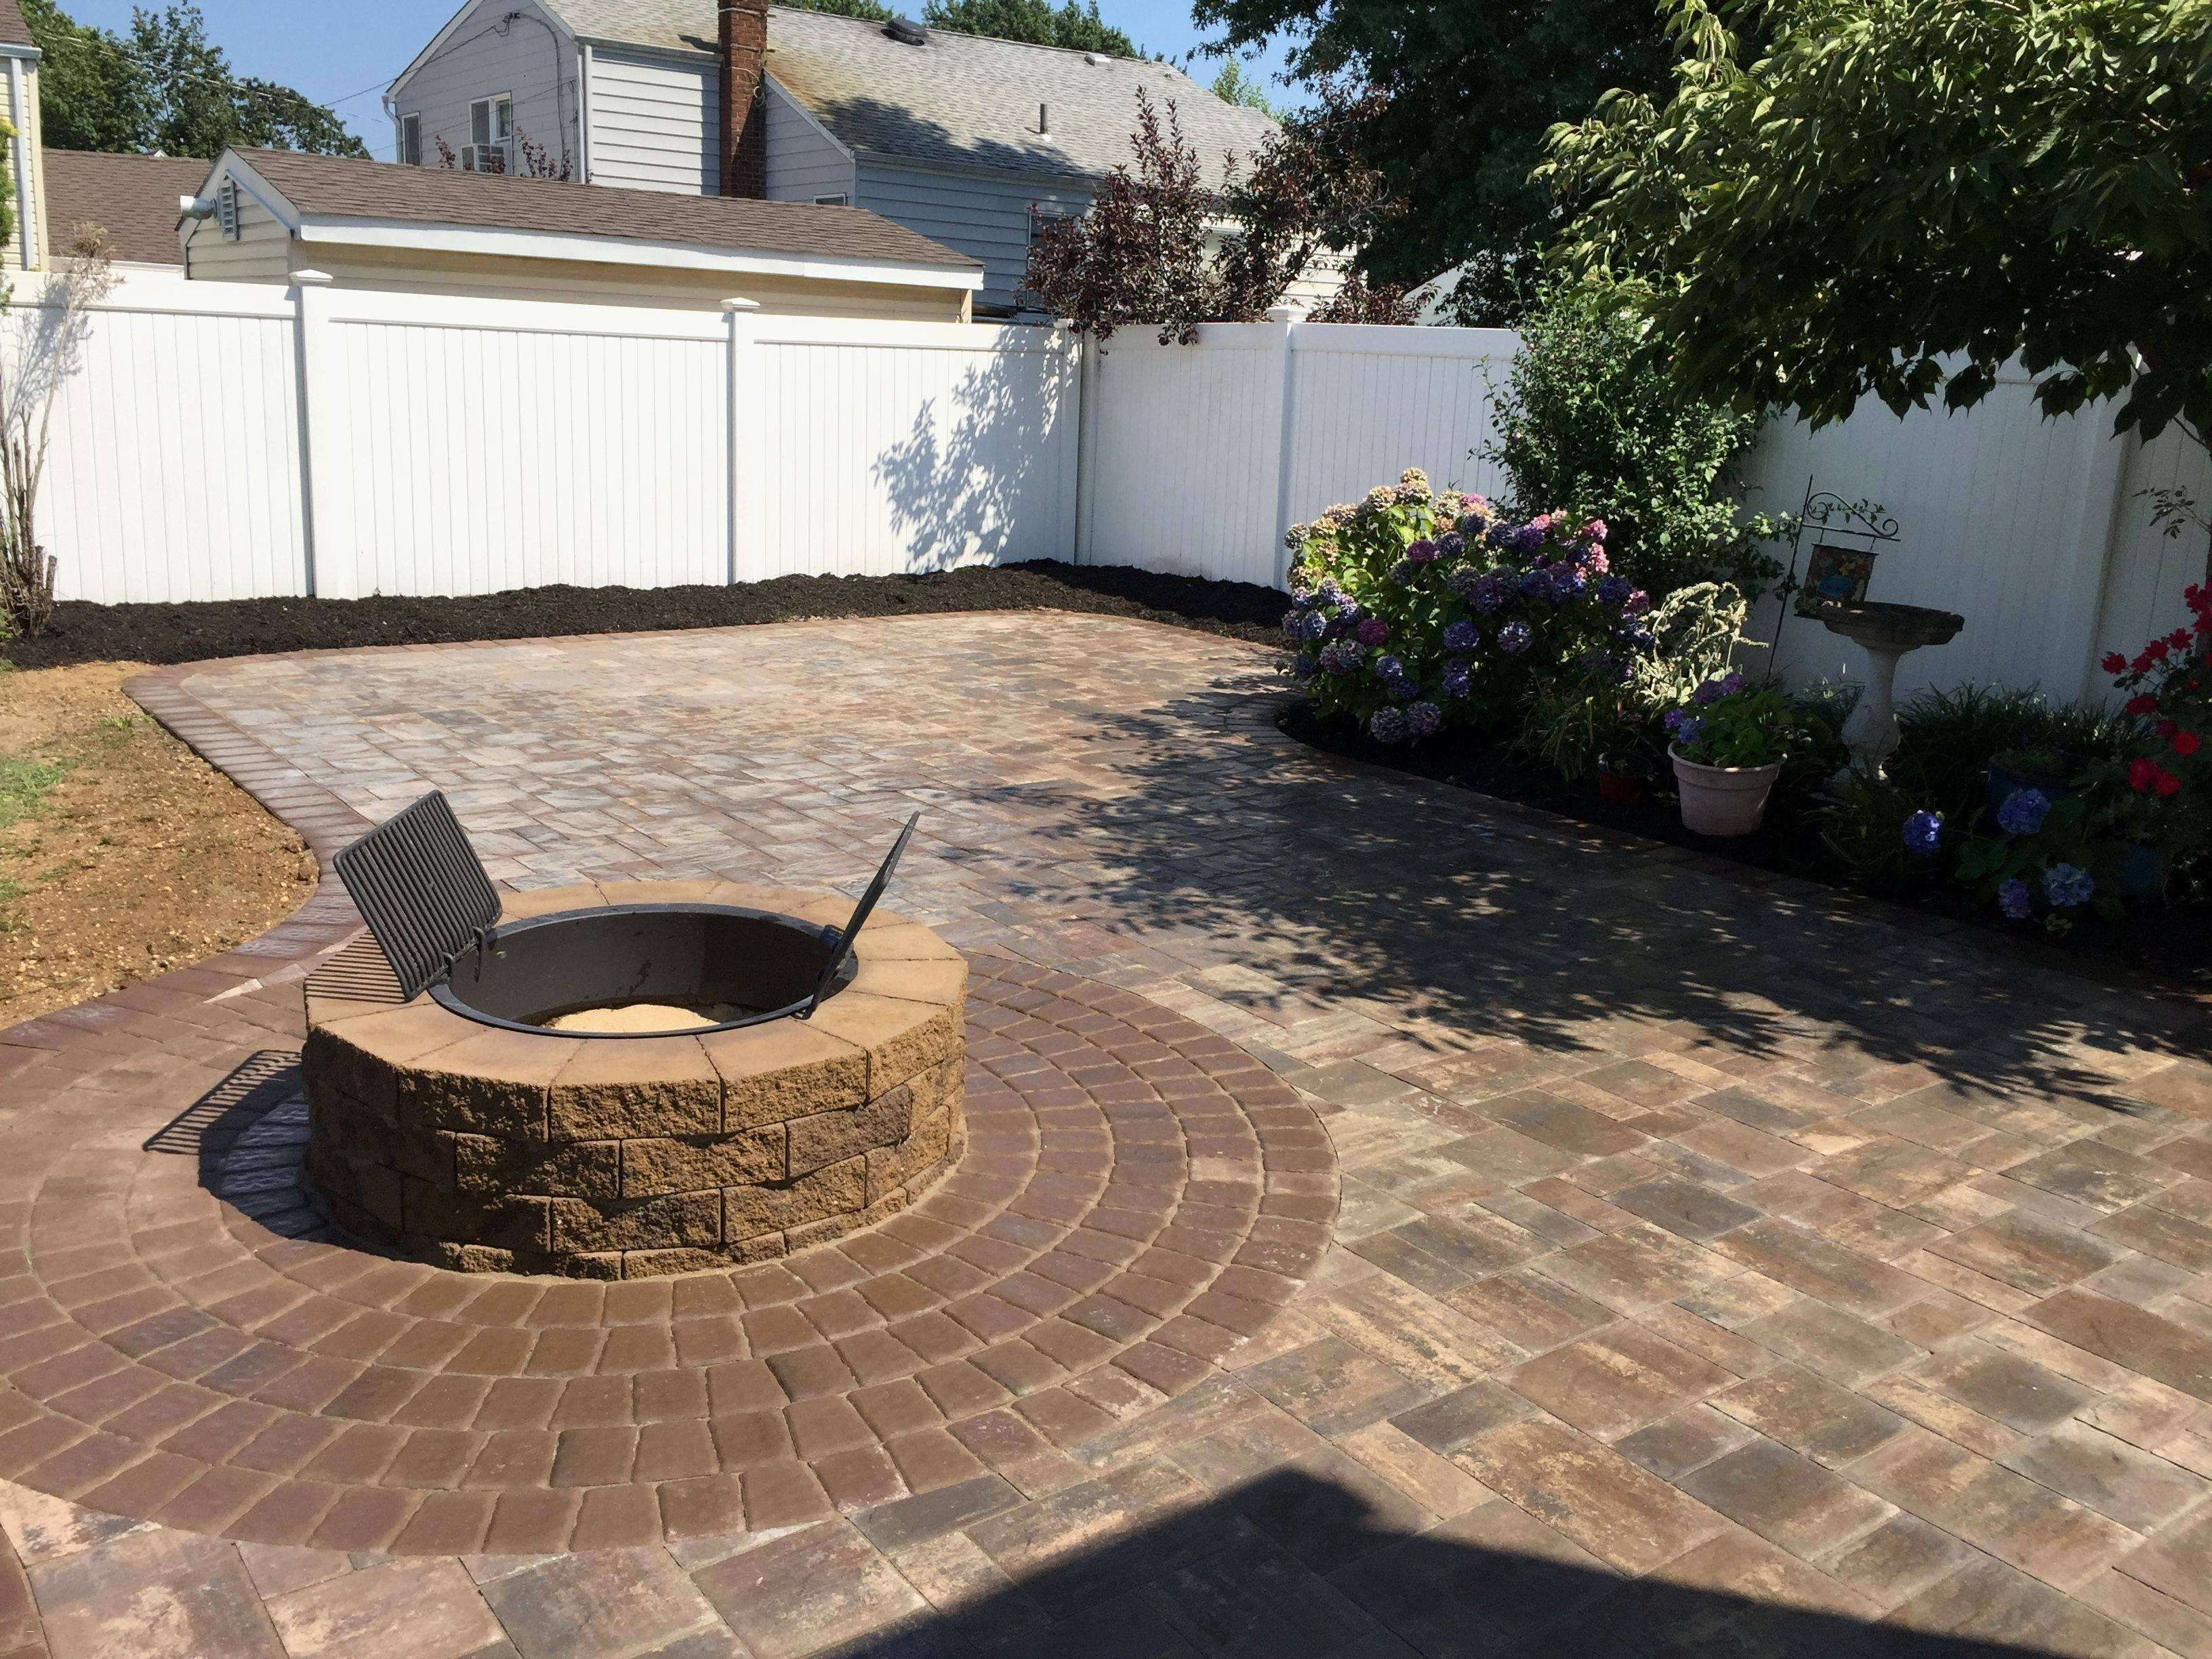 Tyuka Info Patio Pavers Design Backyard Patio Stones Backyard landscaping ideas with pavers